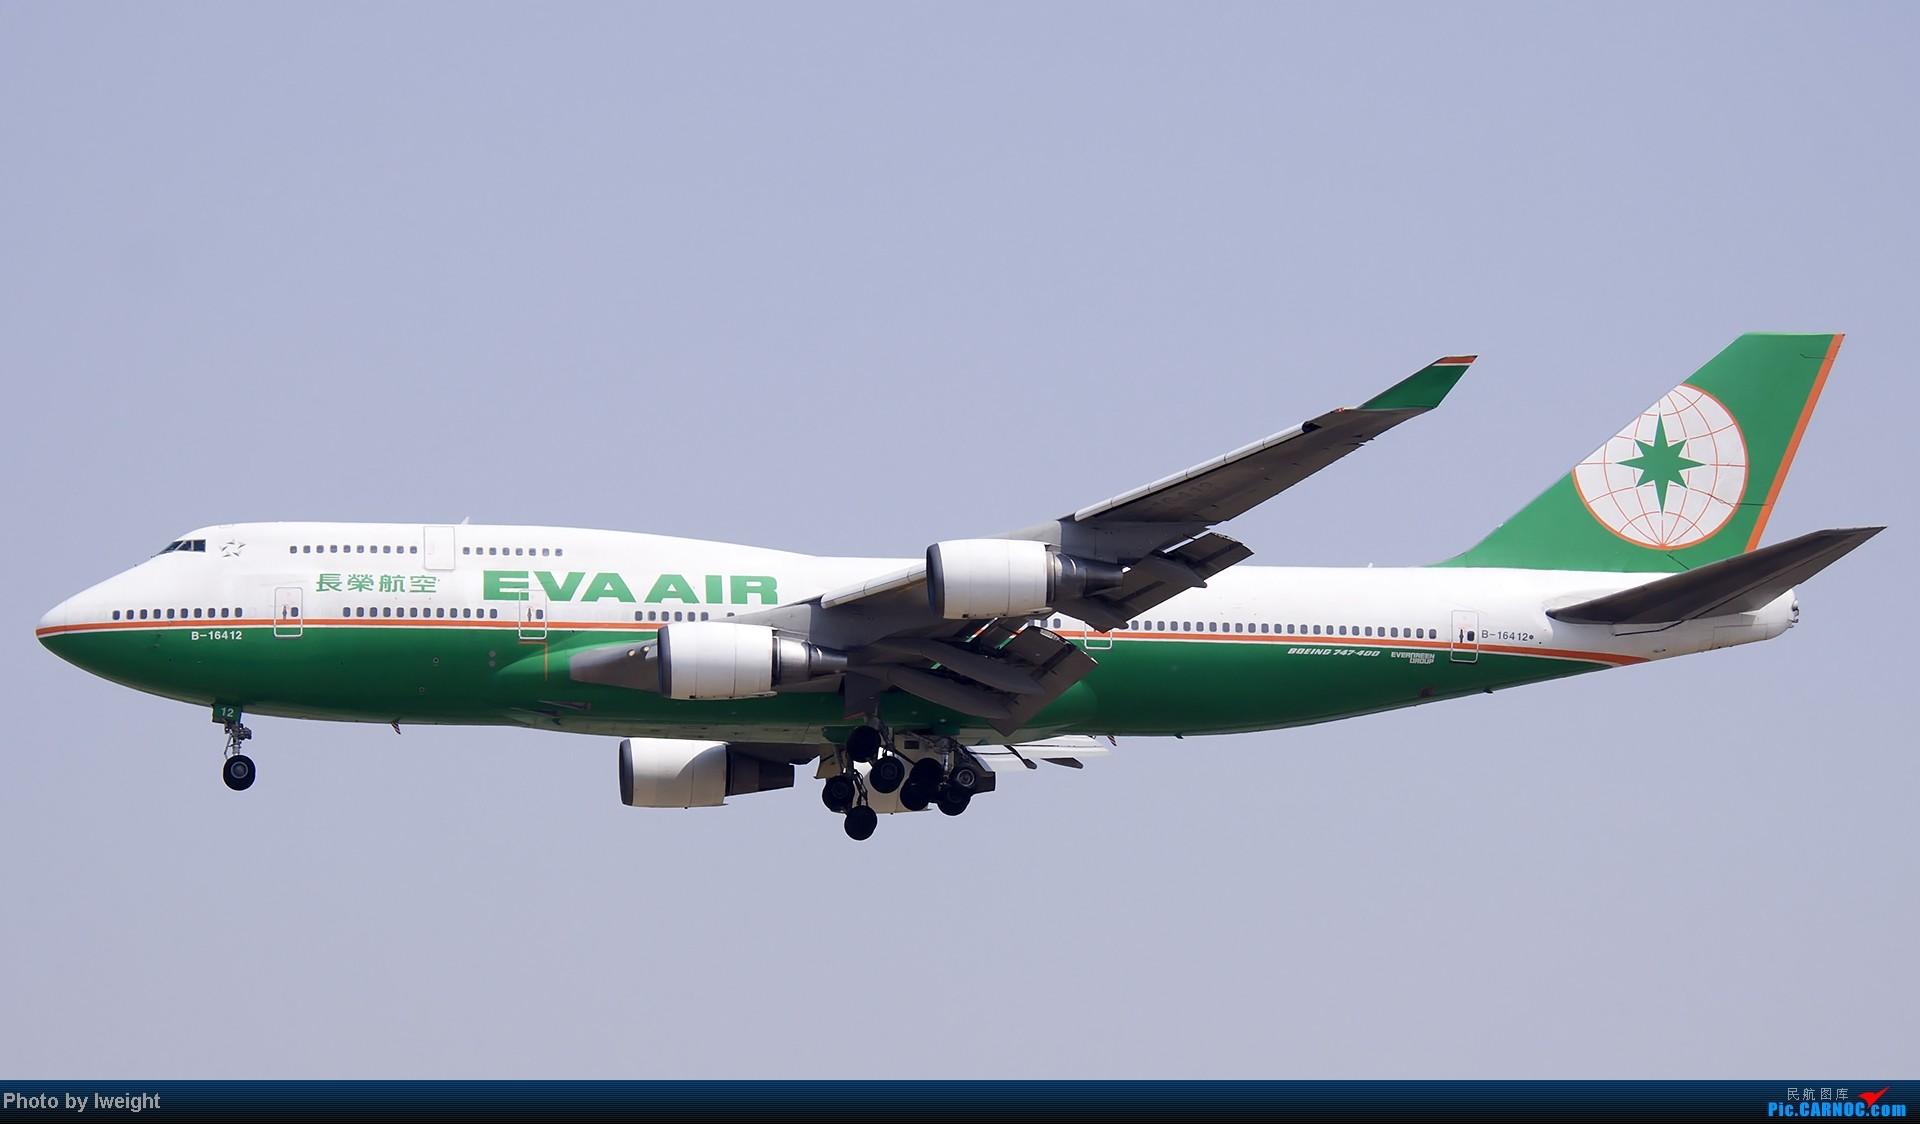 Re:[原创]错过了卡航的巴塞罗那号,只有这些大路货了,泪奔啊 BOEING 747-400 B-16412 中国北京首都机场